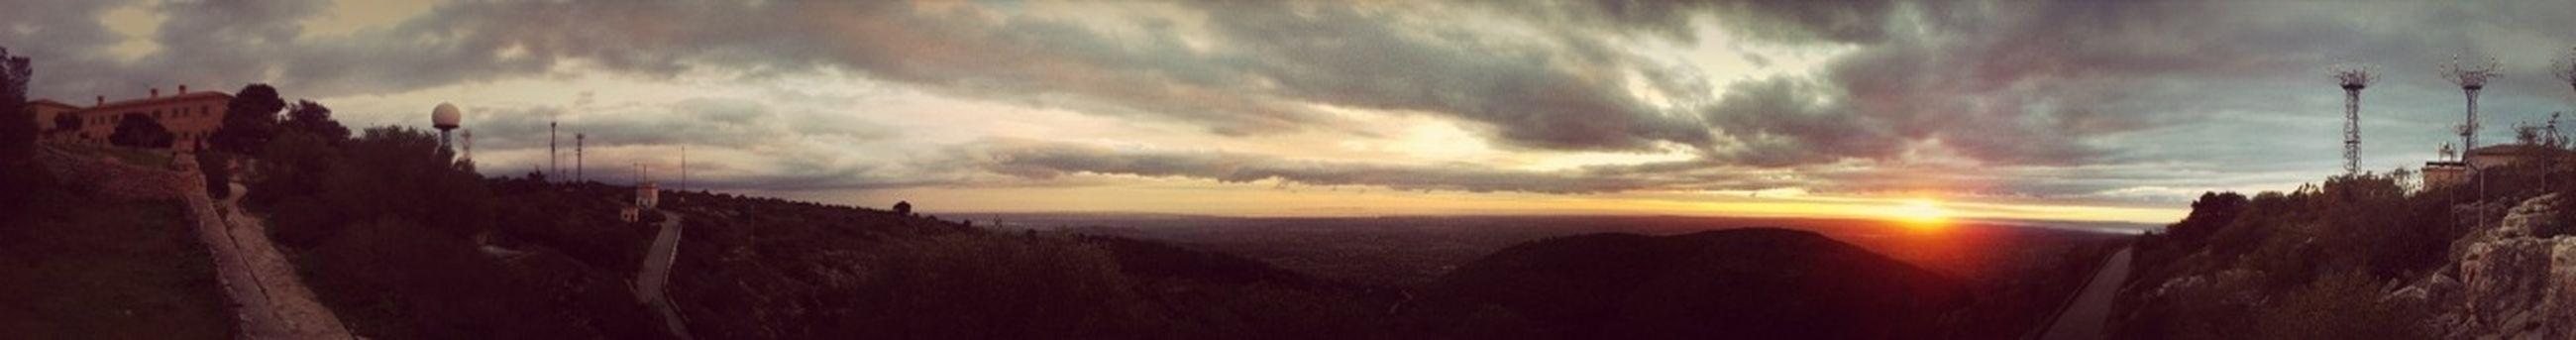 Sunset Landscape Divelandscape